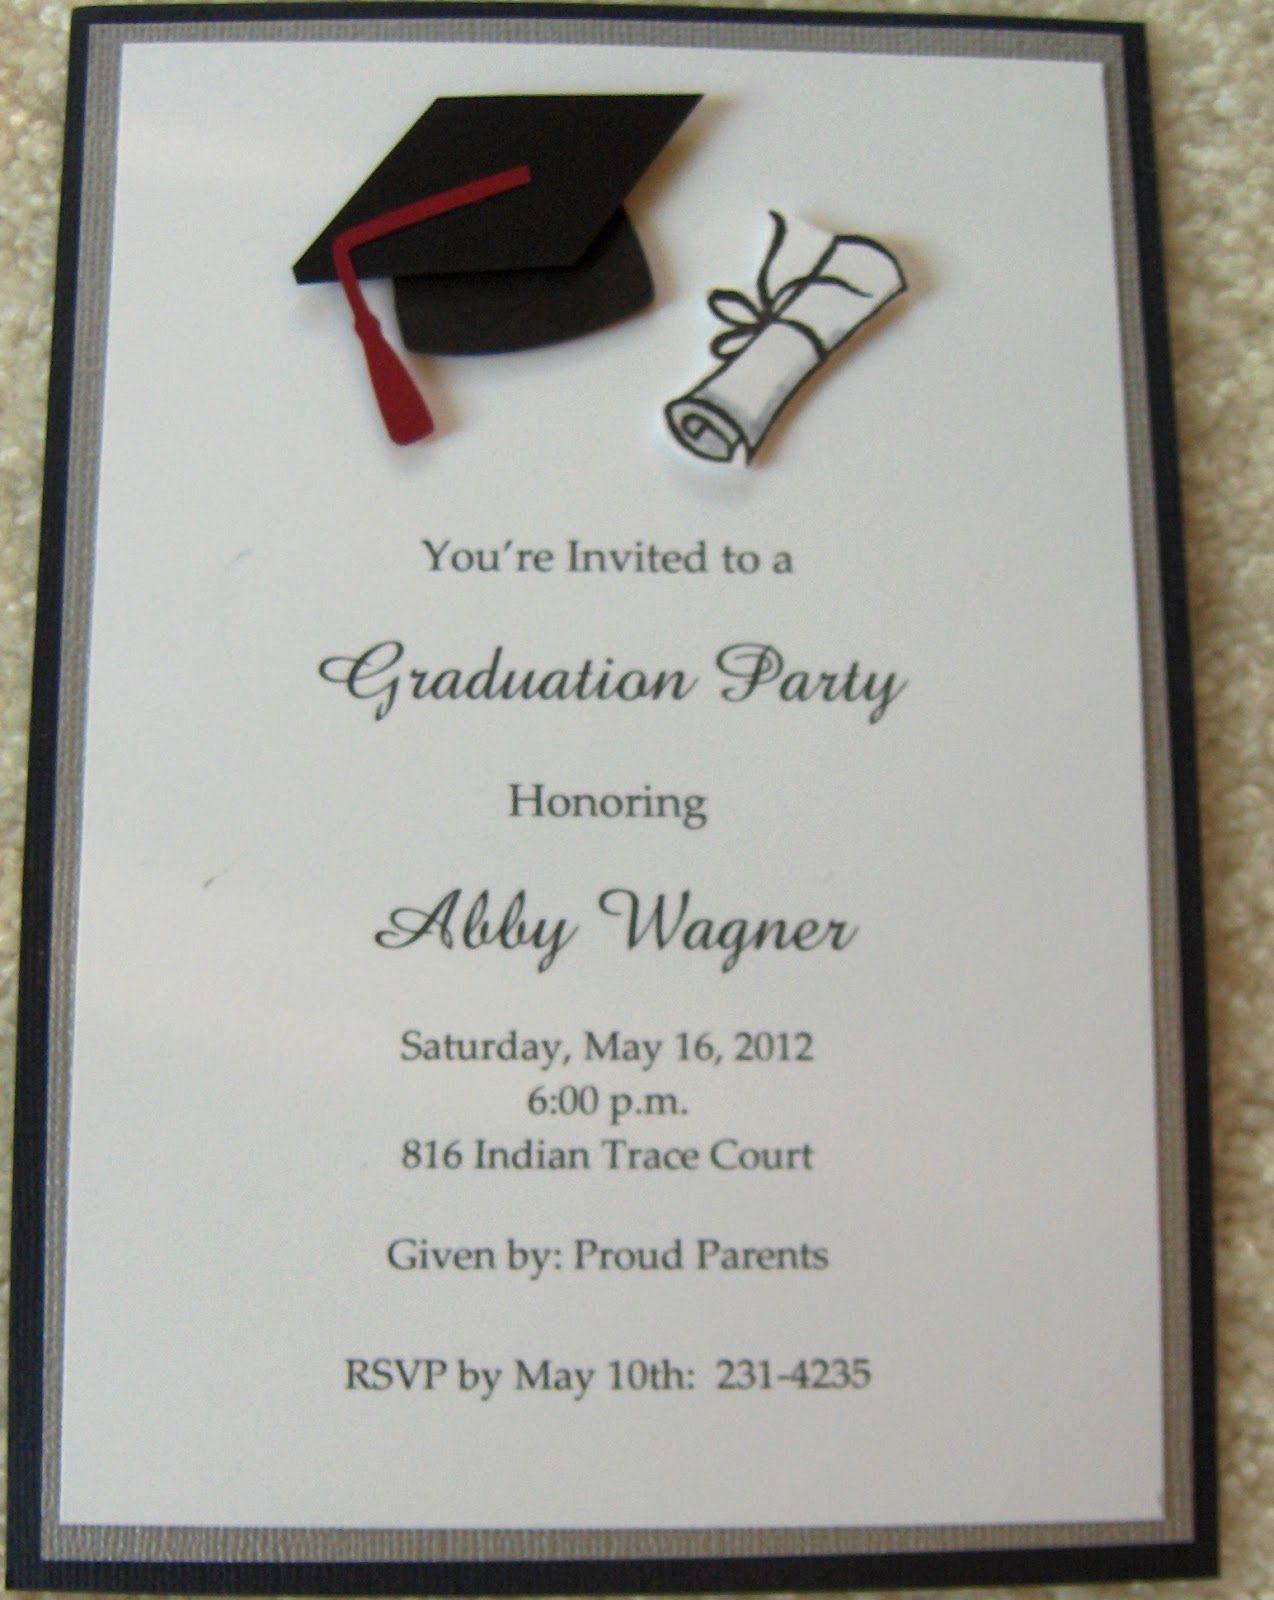 elegant-graduation-party-invitation-colors-formal-high-school ...